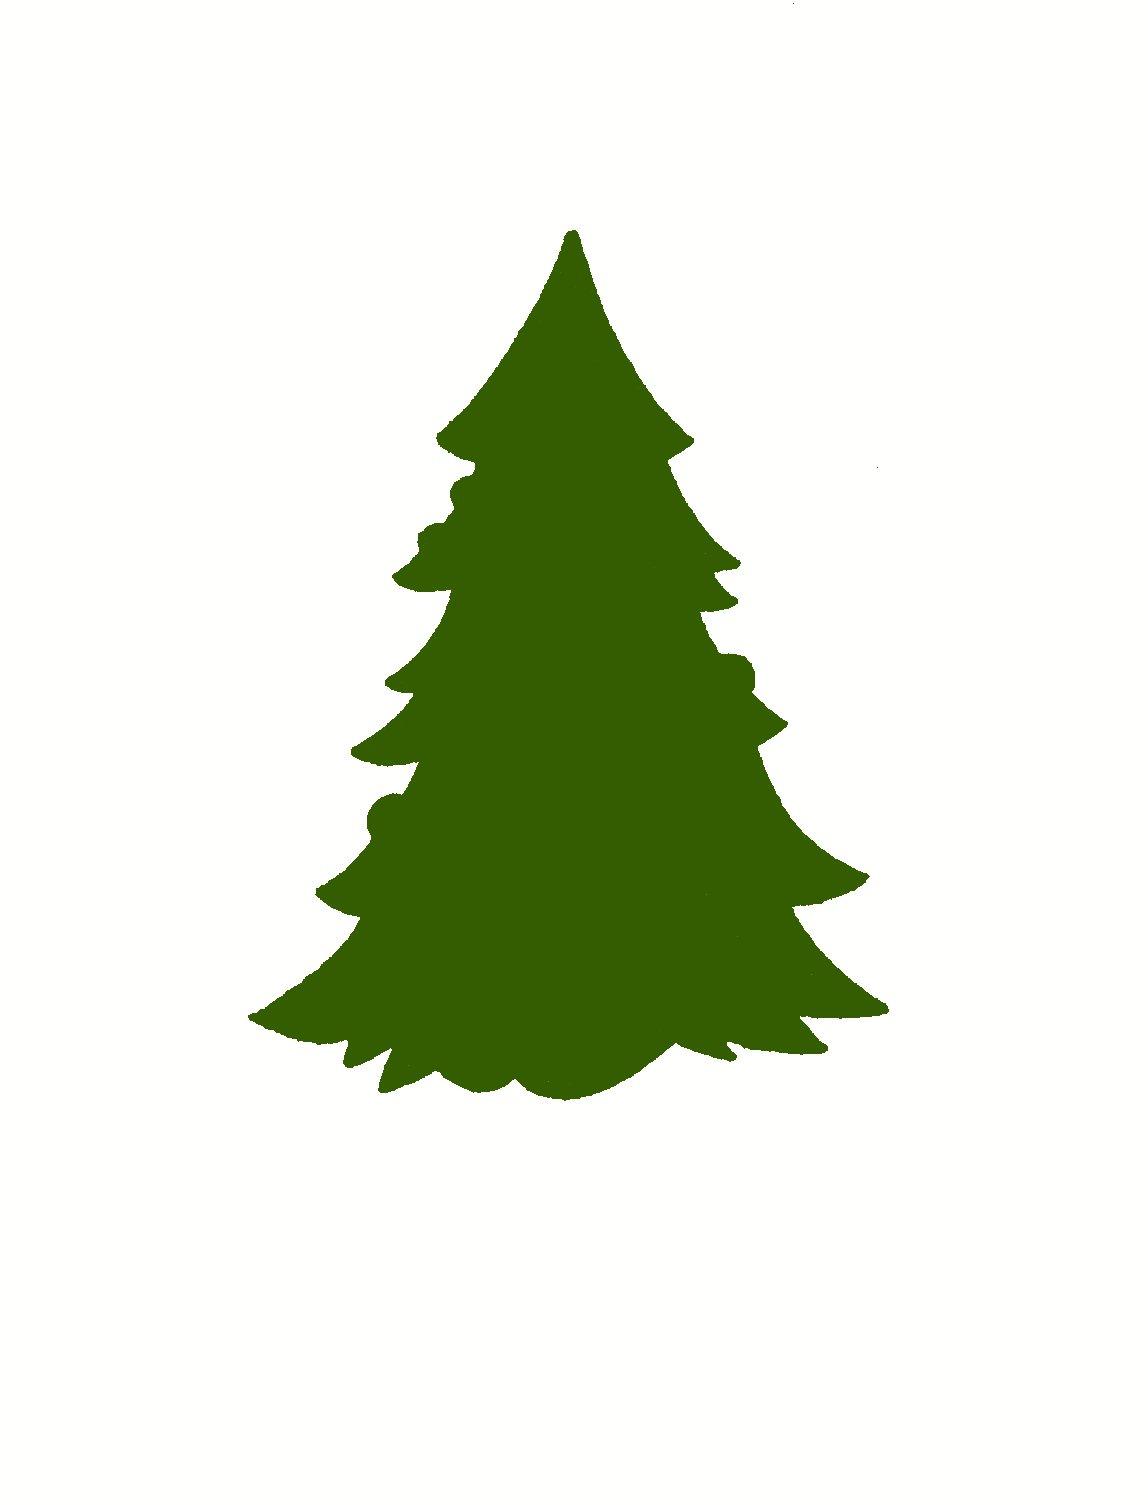 1148x1505 Christmas Tree Silhouette